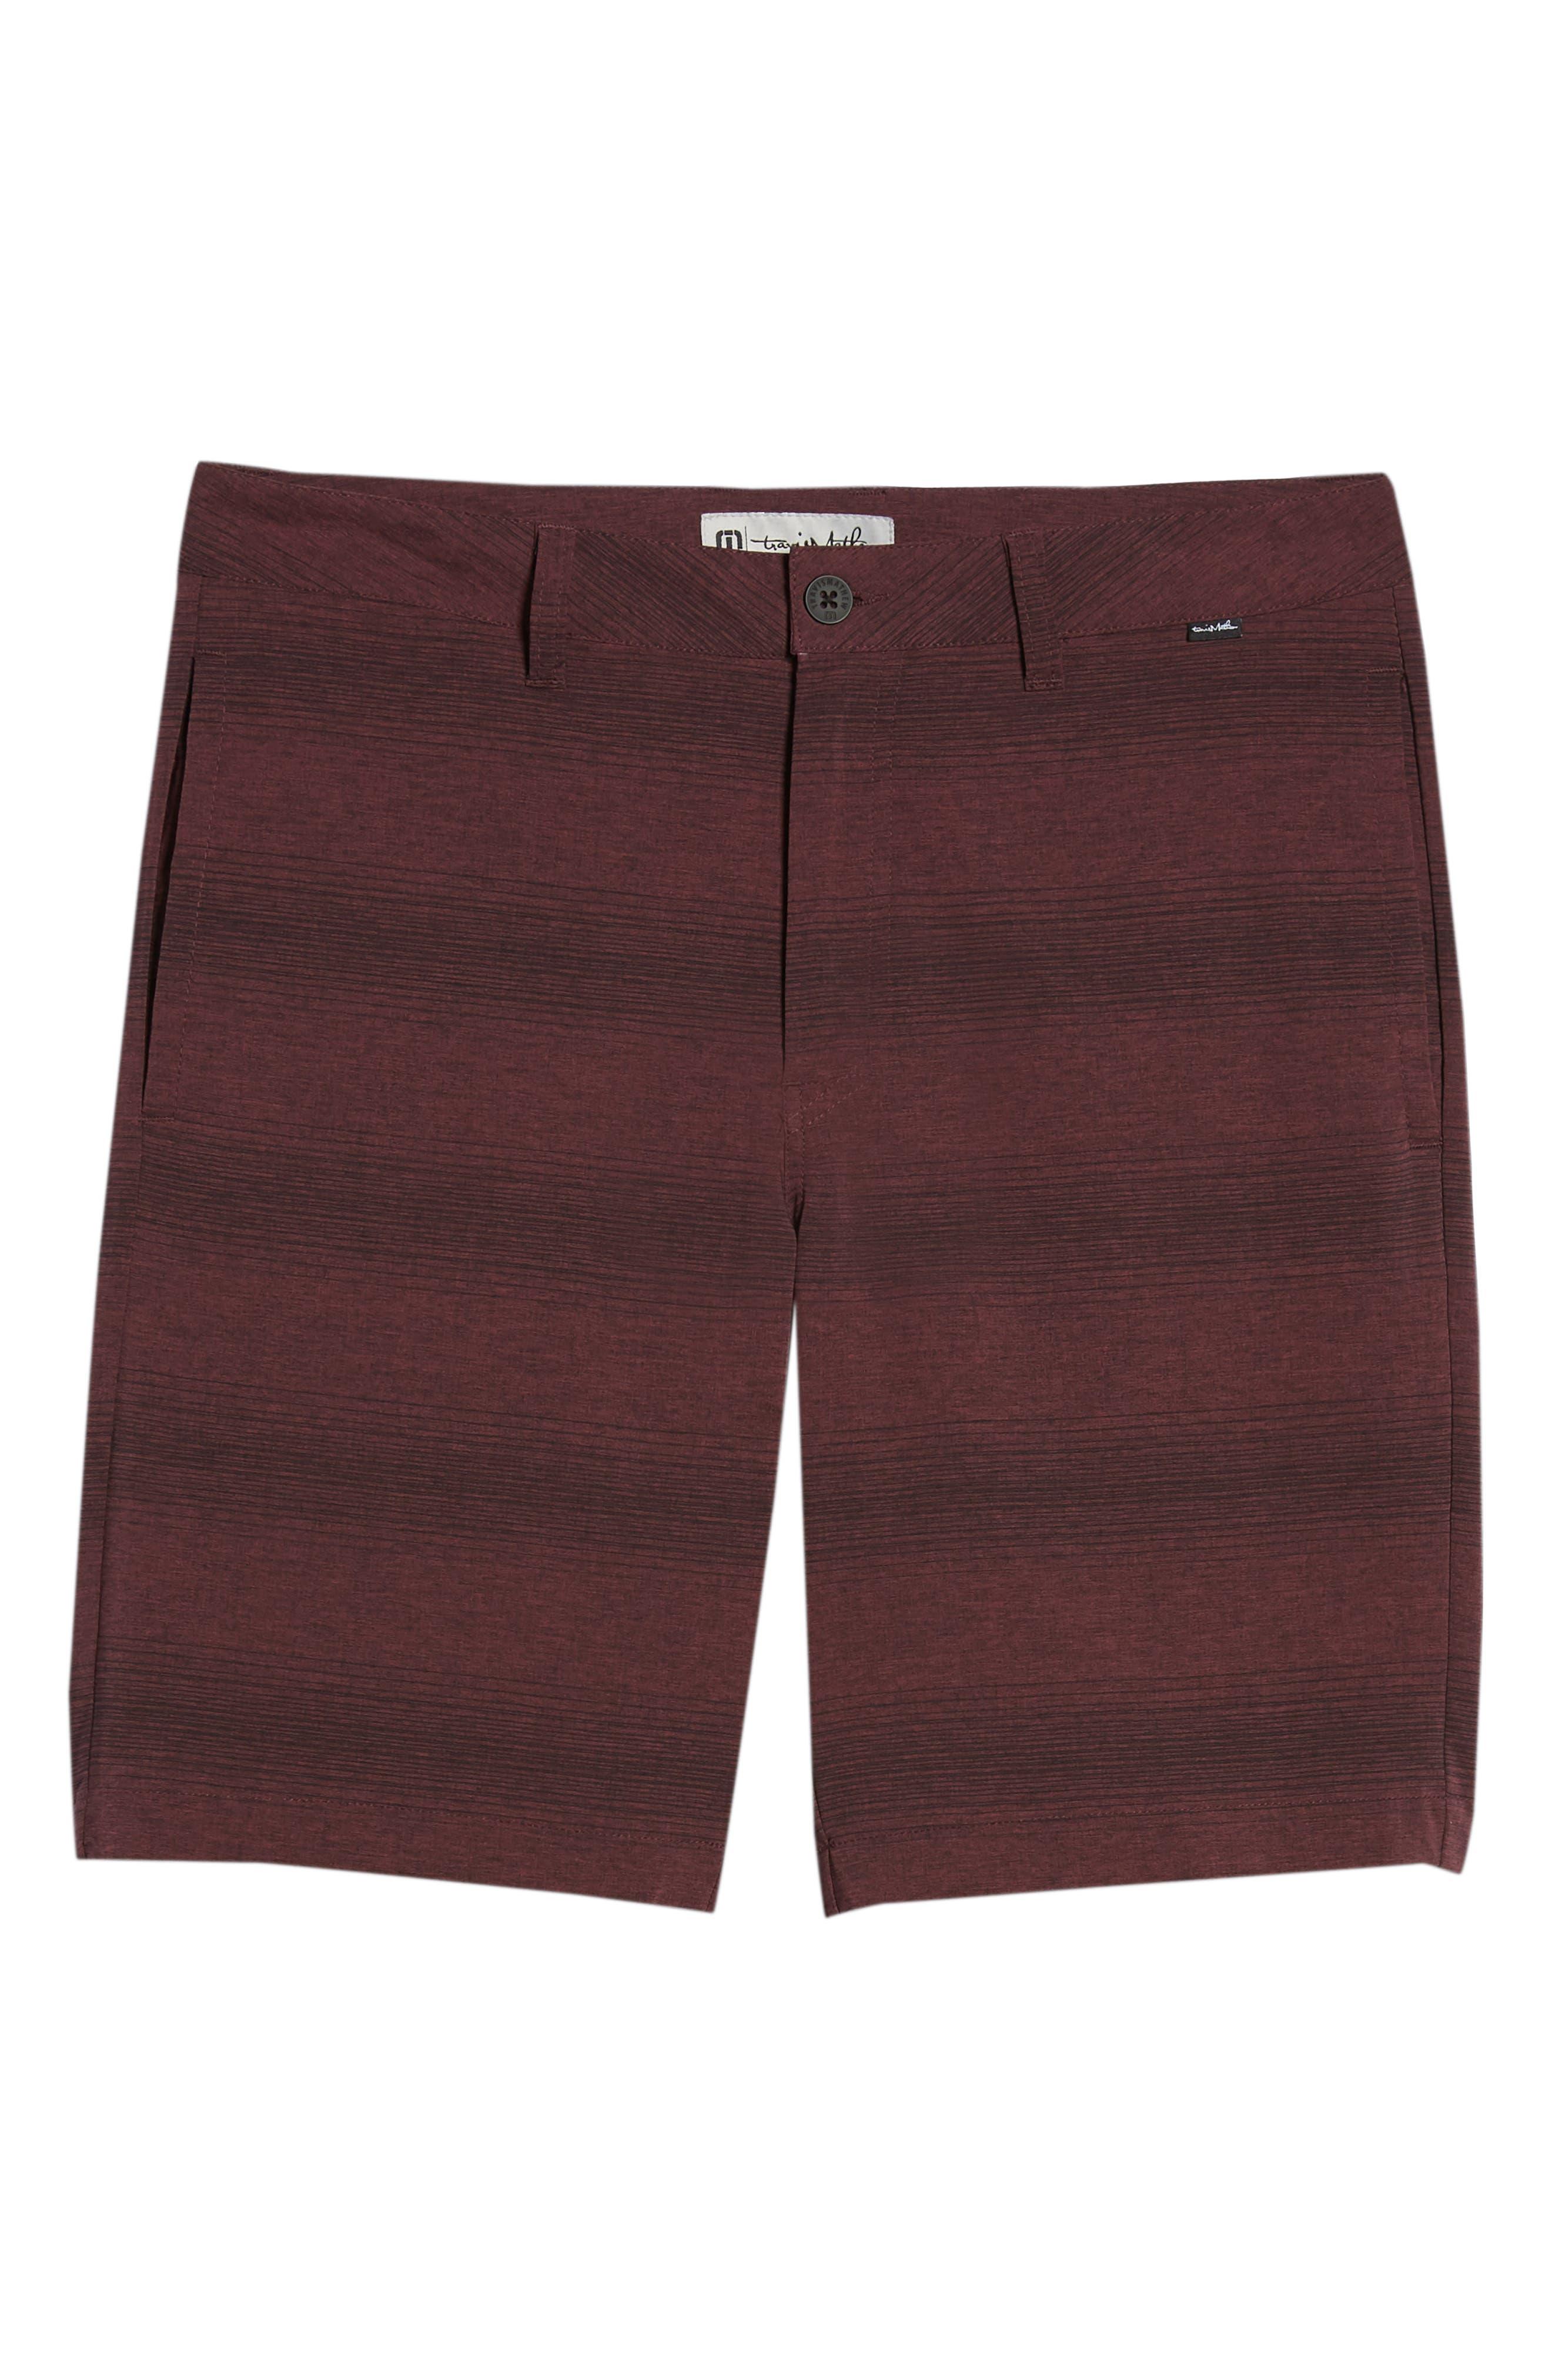 TRAVISMATHEW, Tepic Shorts, Alternate thumbnail 6, color, WINETASTING/ BLACK